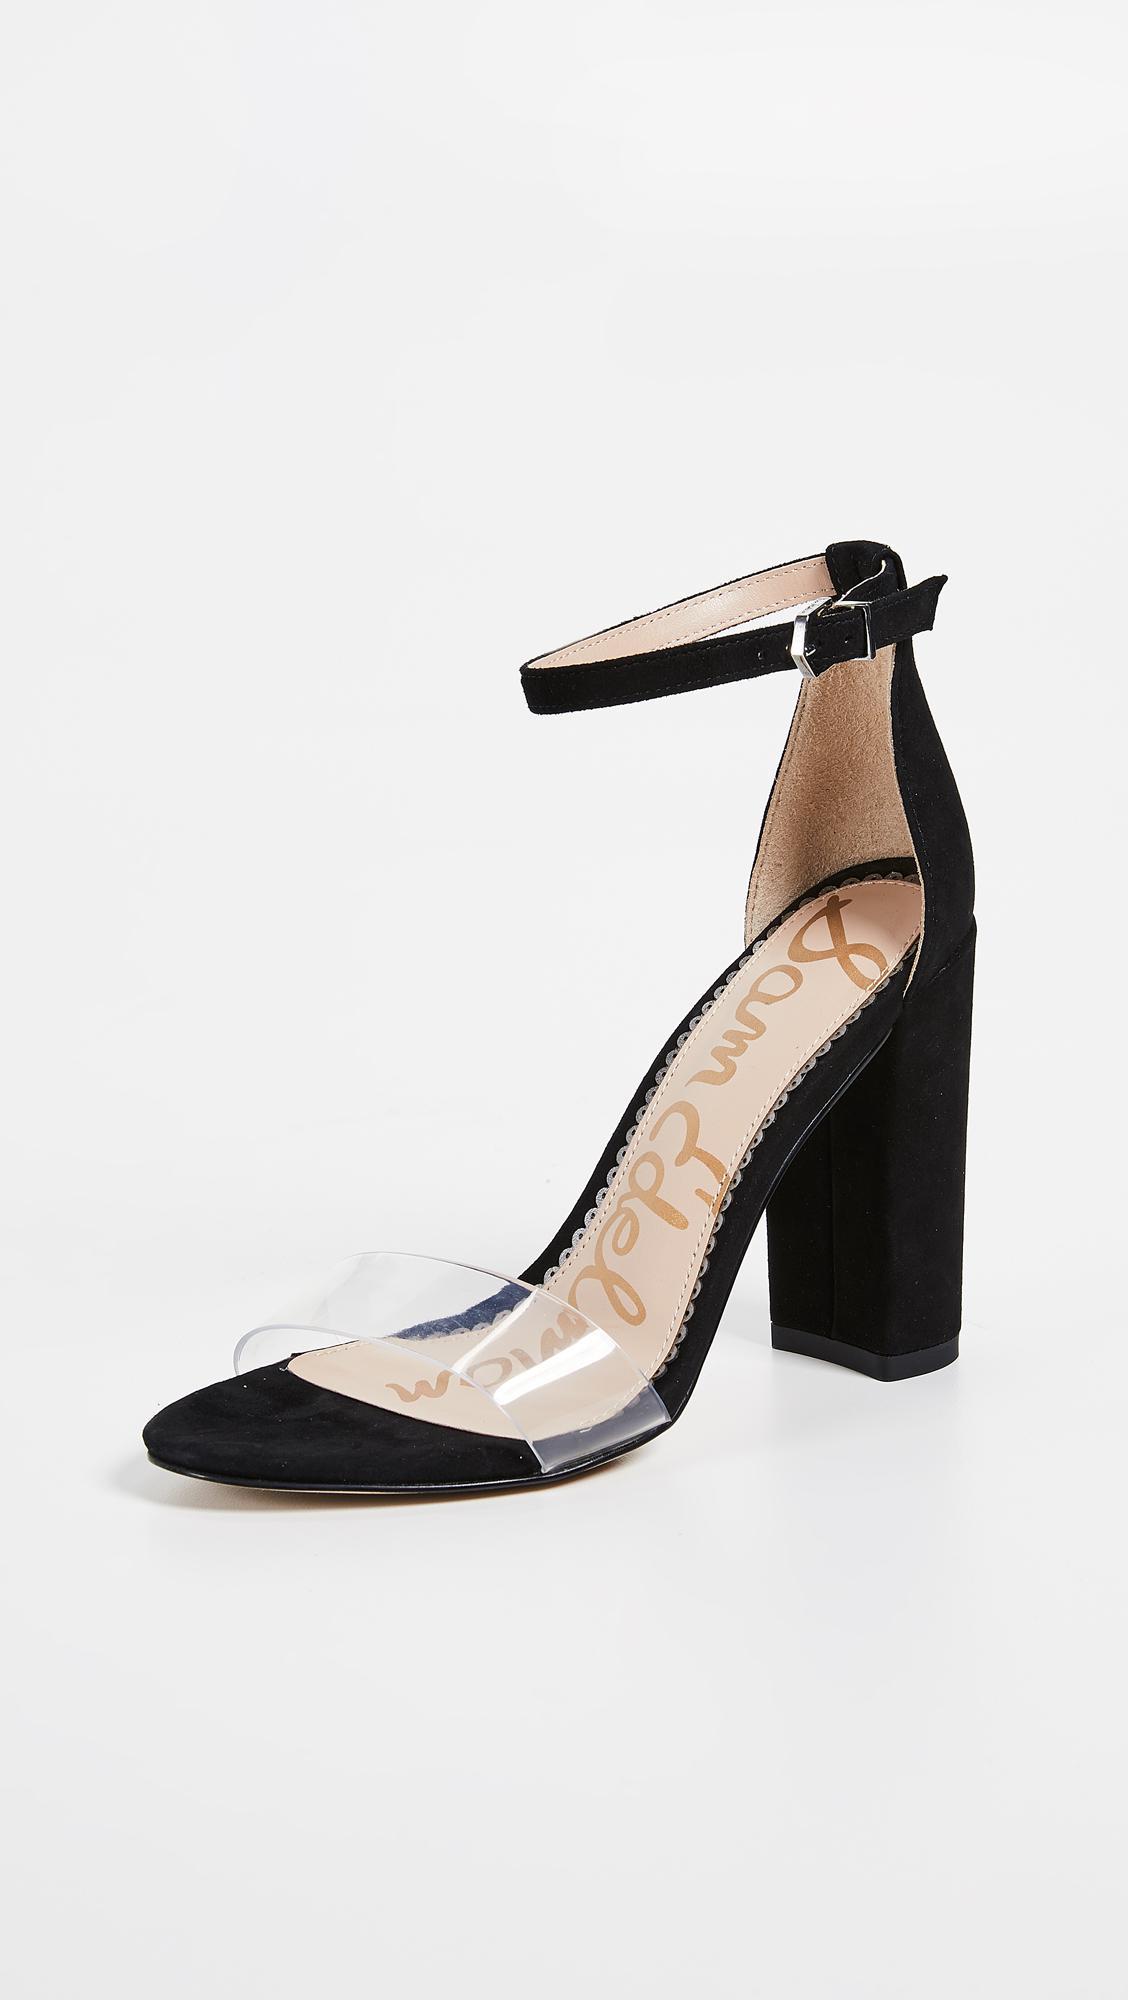 7e69637aaebec0 Lyst - Sam Edelman Yaro Sandals in Black